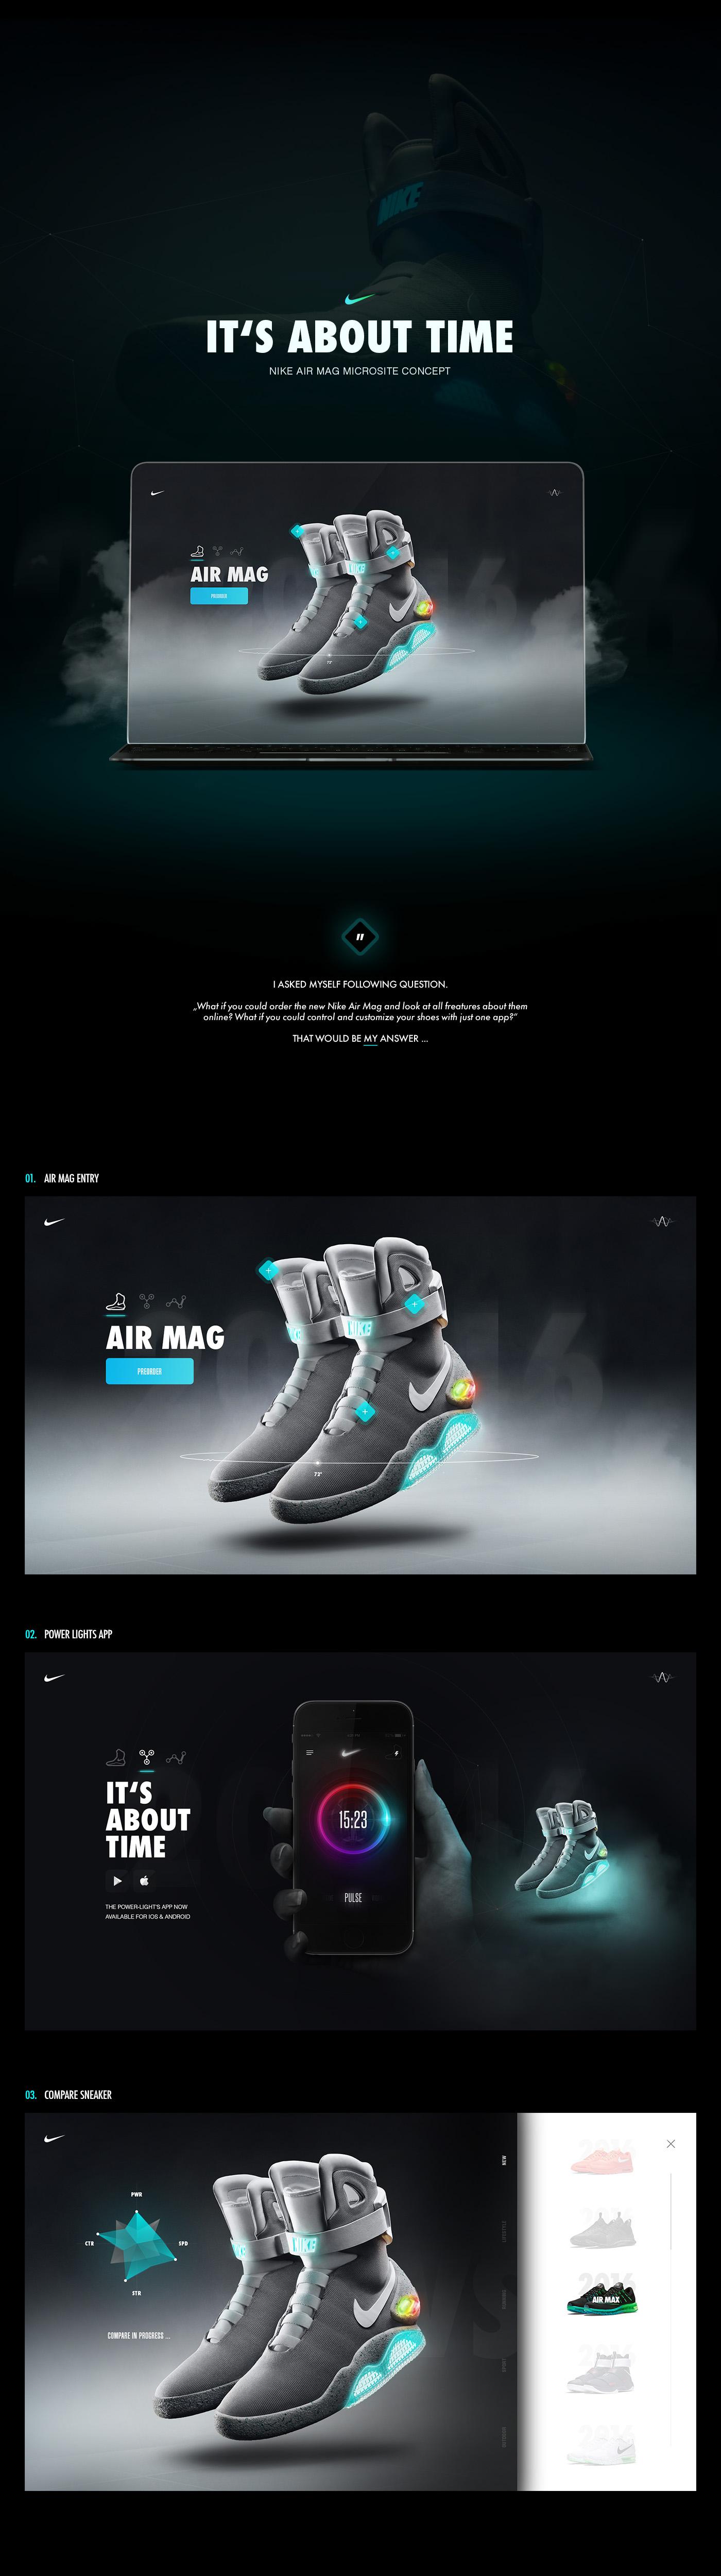 Nike Air Mag Microsite & App Concept